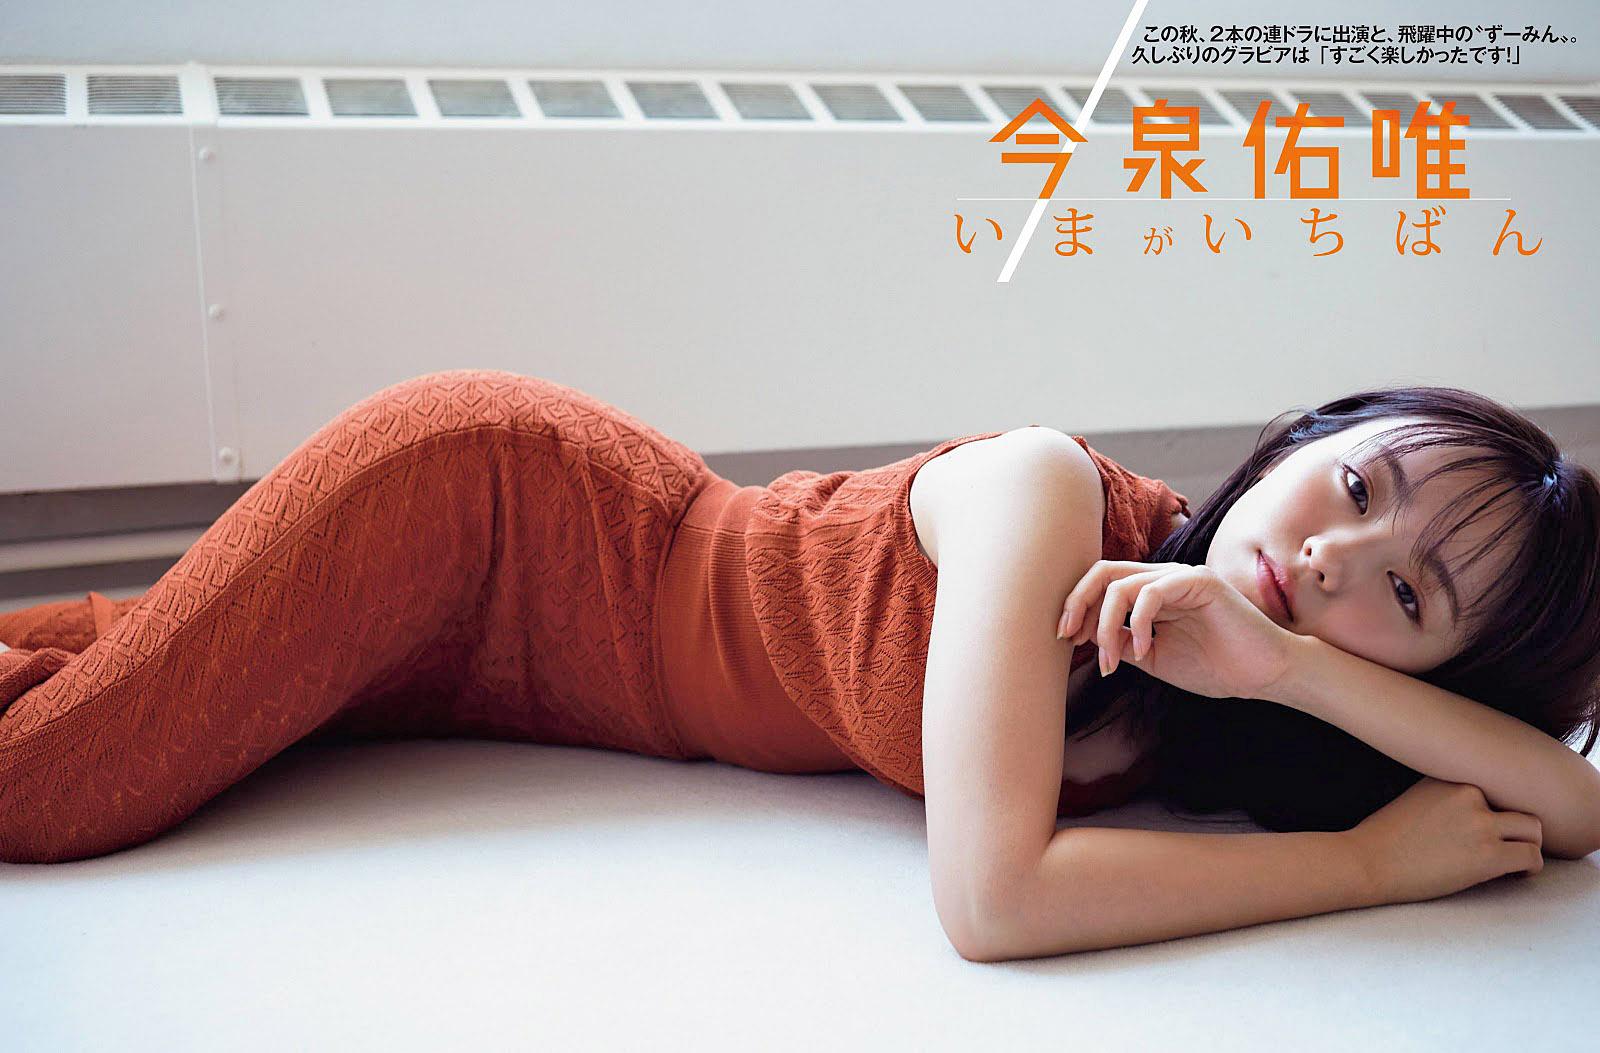 Yui Imaizumi Flash 191105 02.jpg